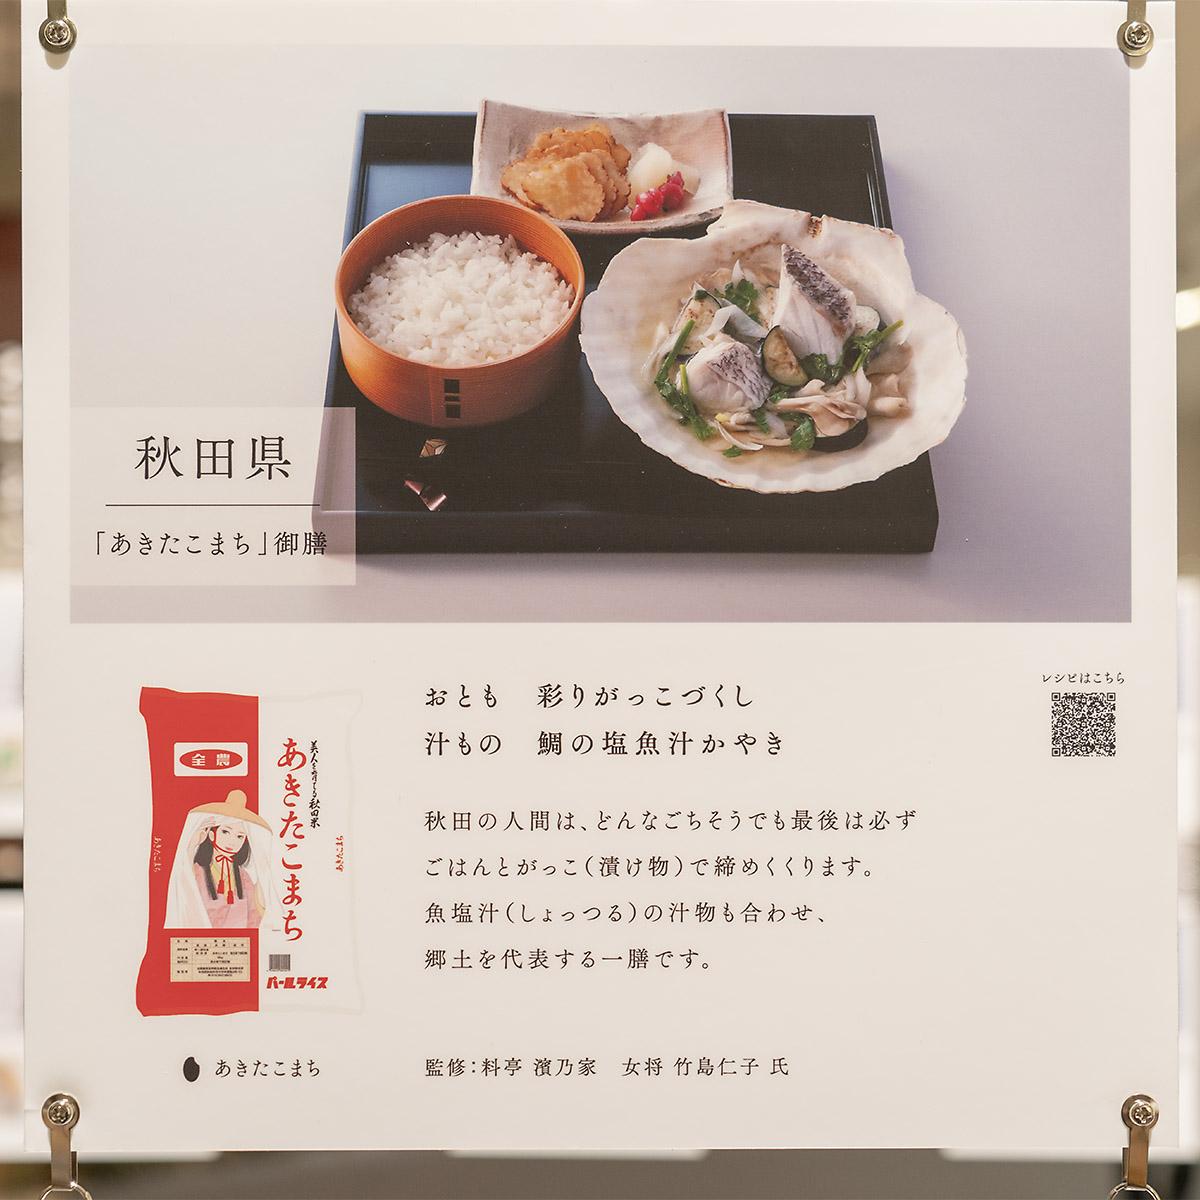 「OKOME STORY MUSEUM」秋田の「あきたこまち」を使った郷土料理